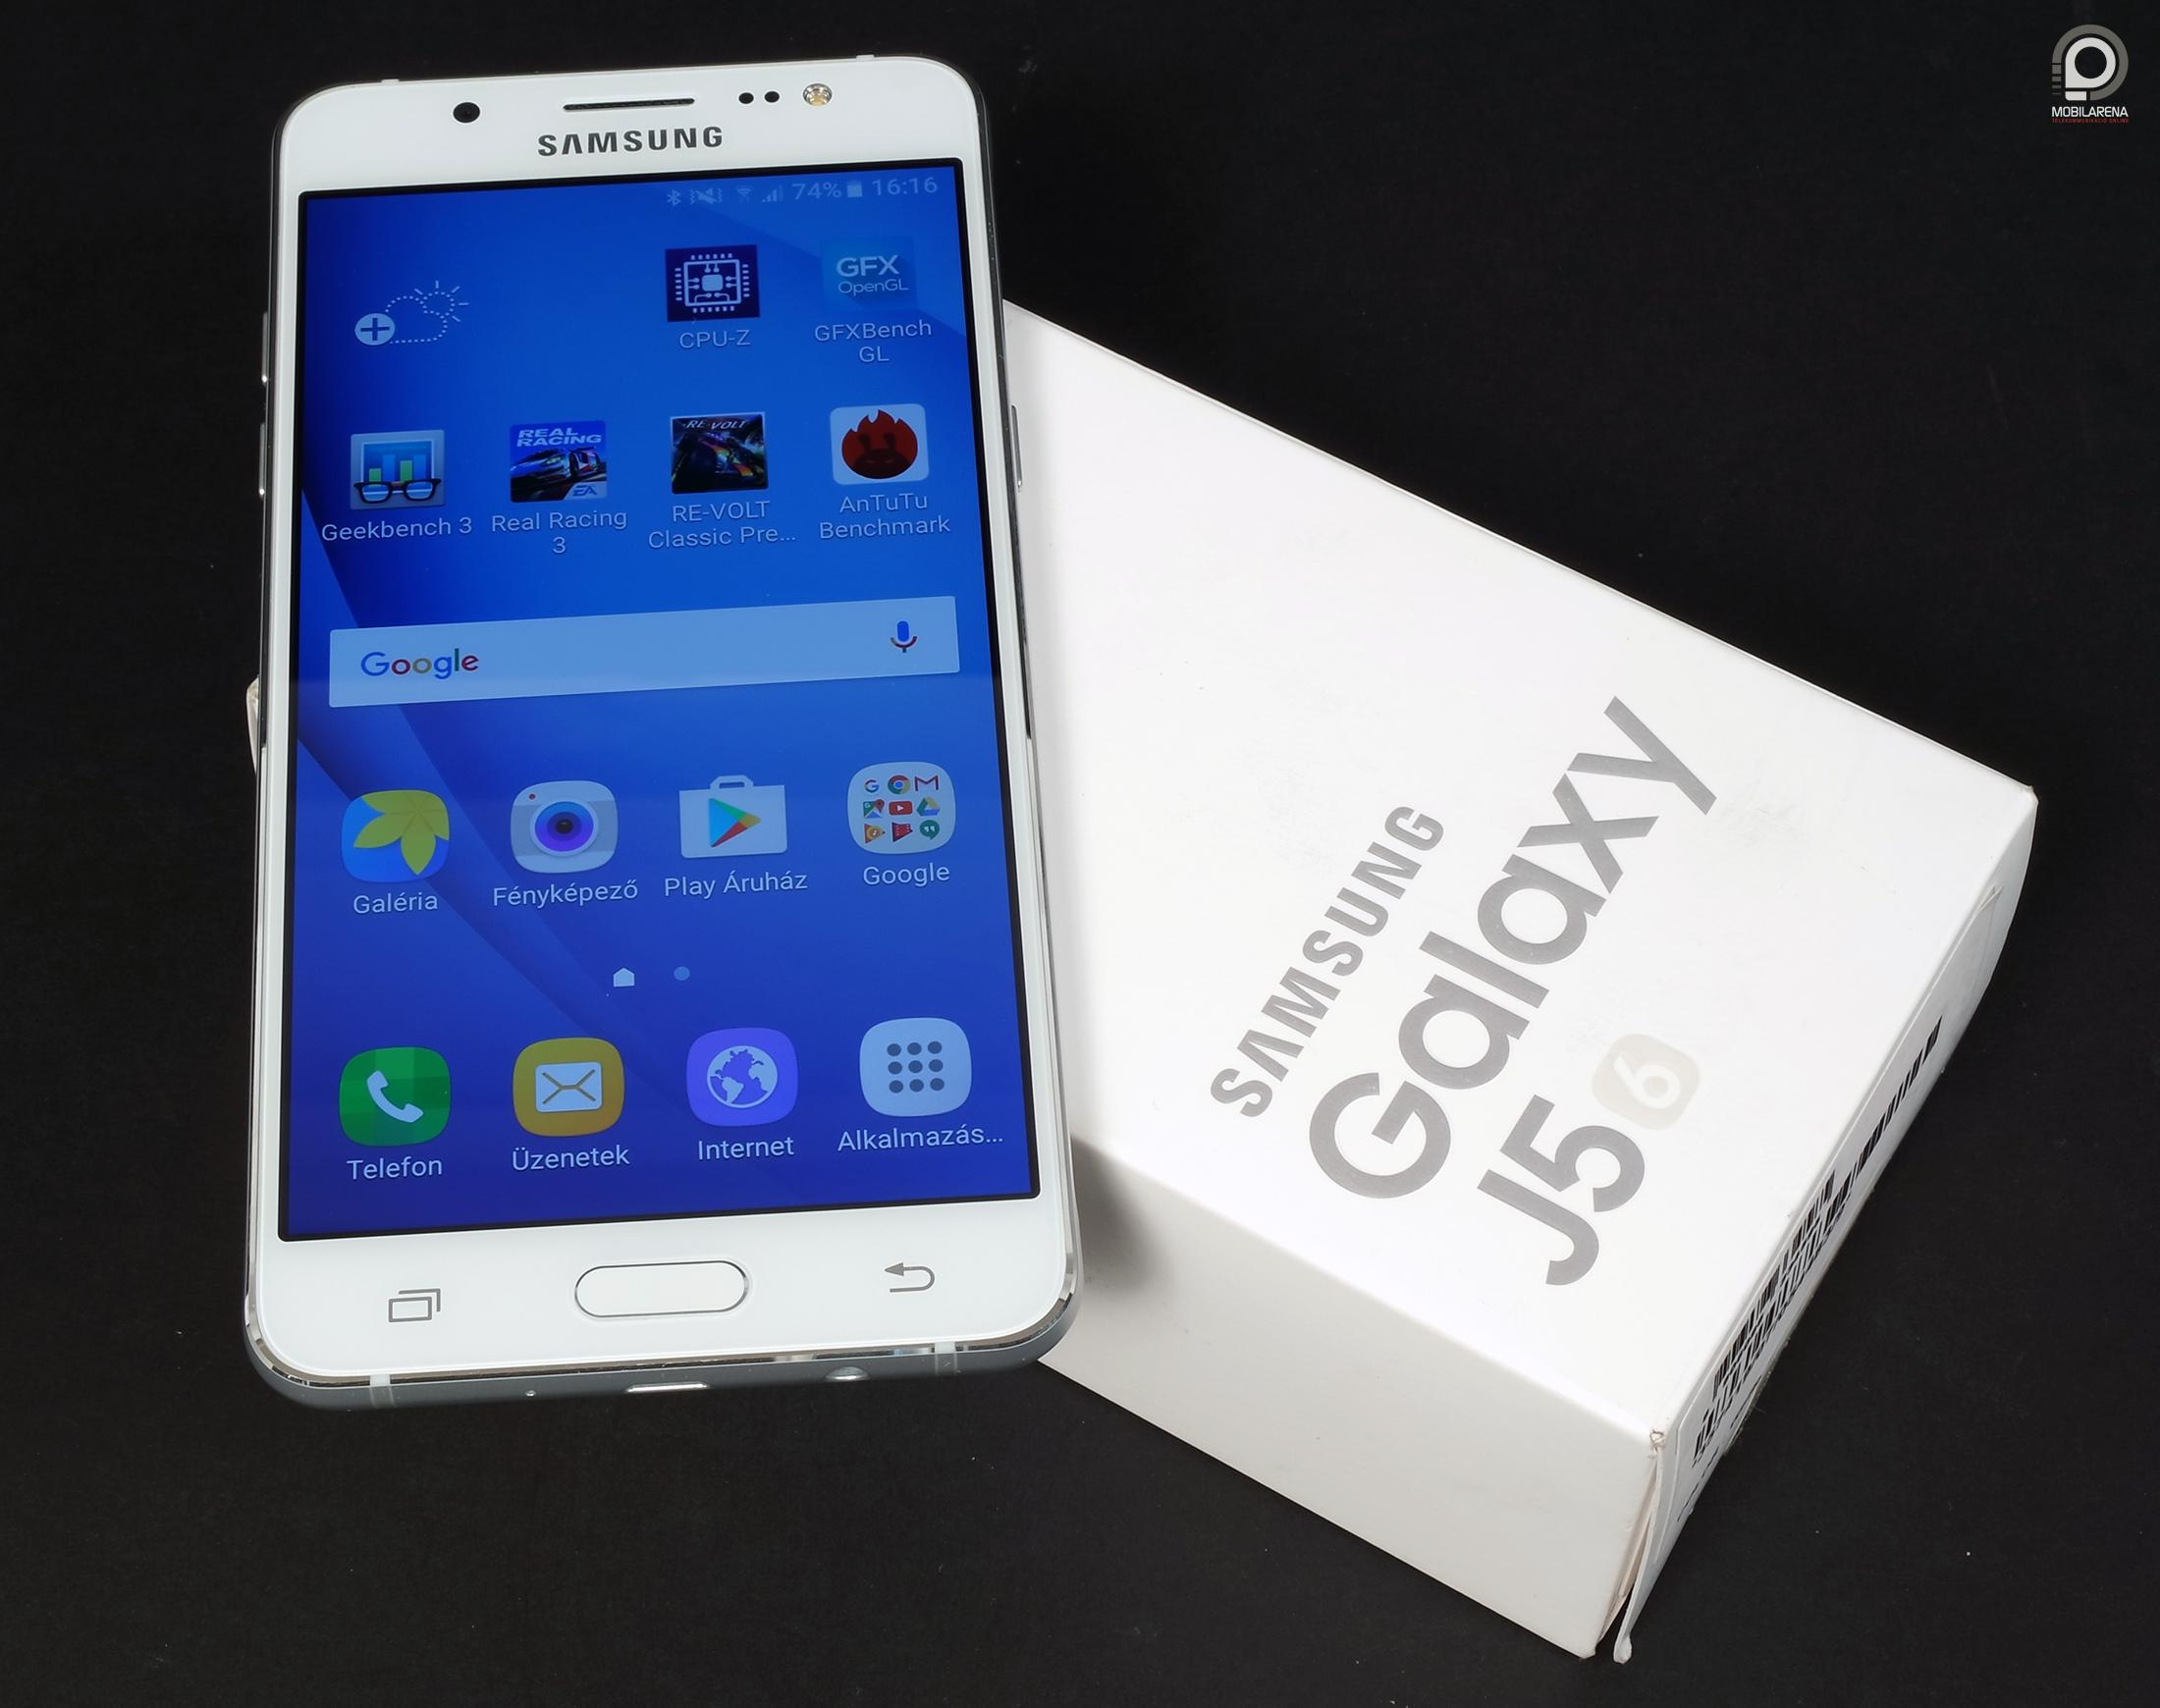 Samsung Galaxy J5 2016 J Ez Ell Is Villan Mobilarena Smj500 8gb A Mobilon Kvl Tltfej Usb Kbel S Headset Kerlt Kartondobozba